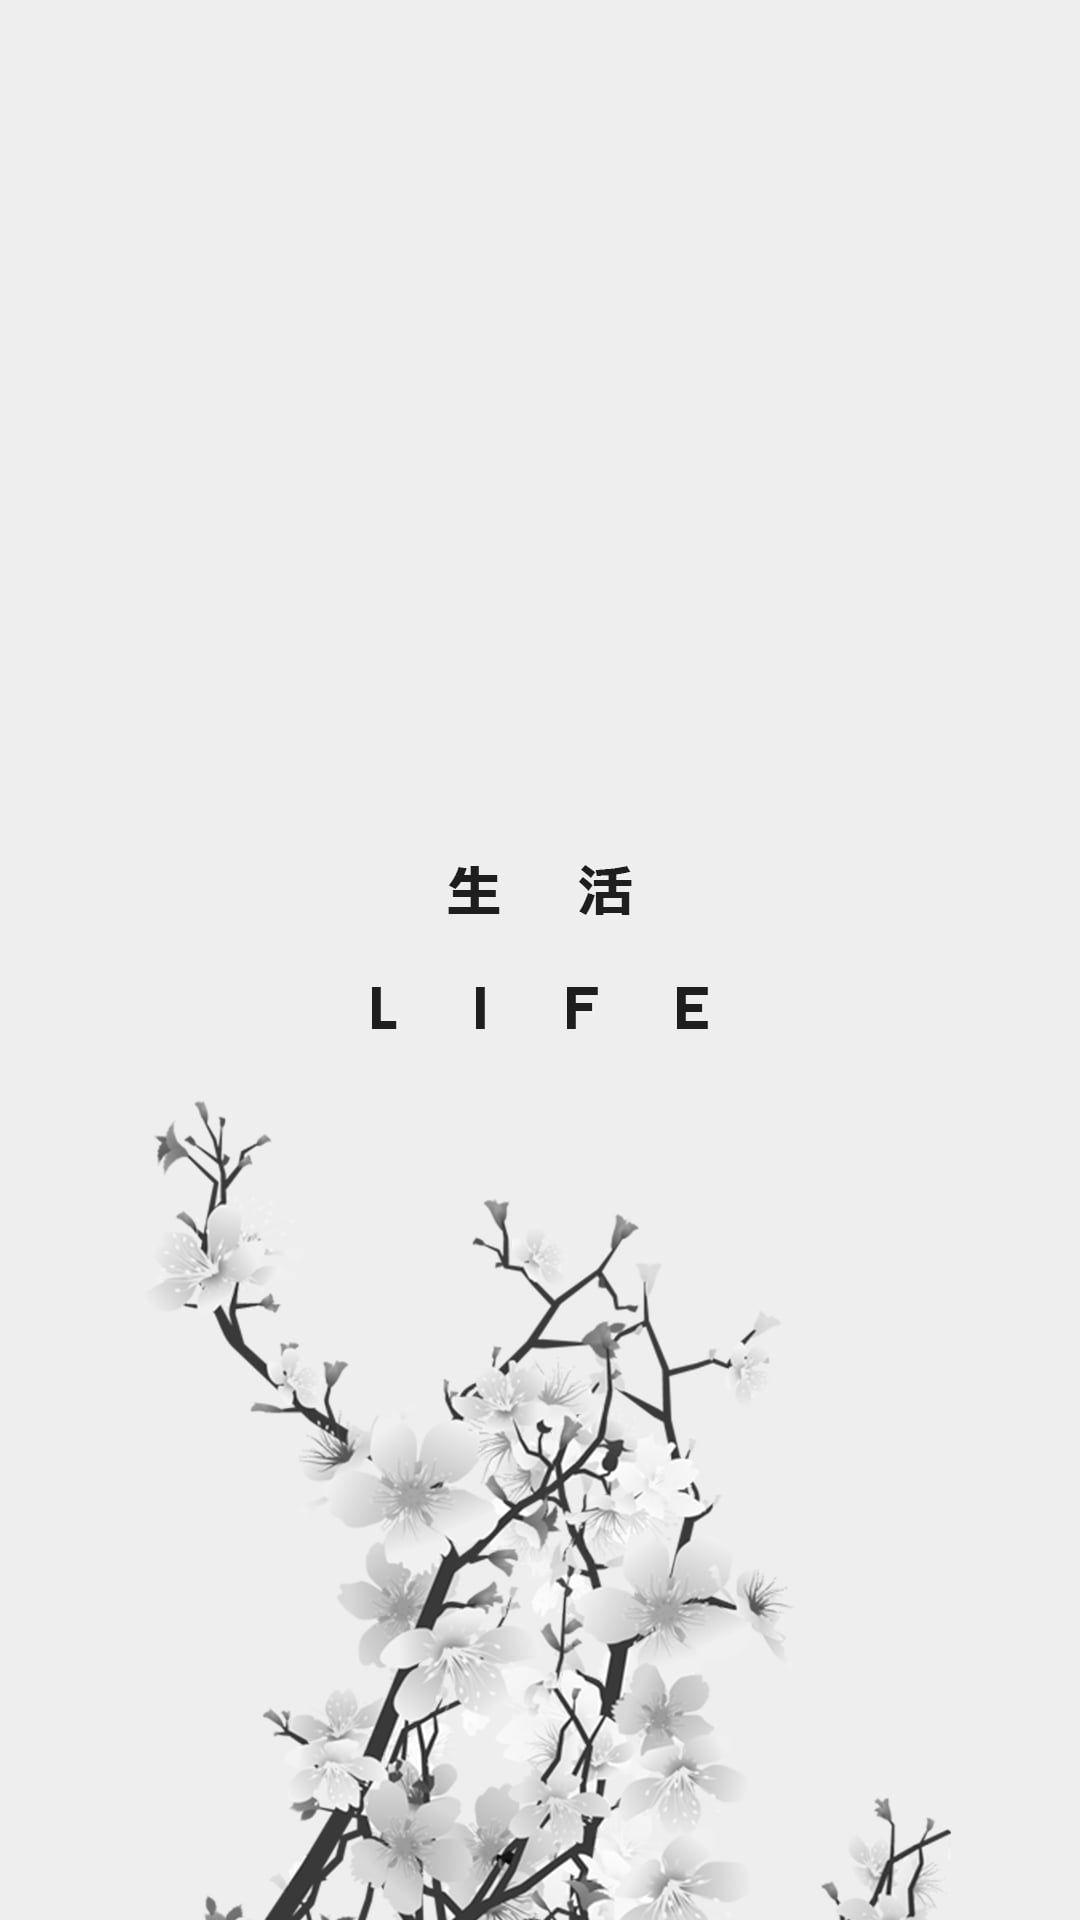 Black Life Text Life Kanji Japan 1080p Wallpaper Hdwallpaper Desktop Words Wallpaper Phone Wallpaper Art Wallpaper